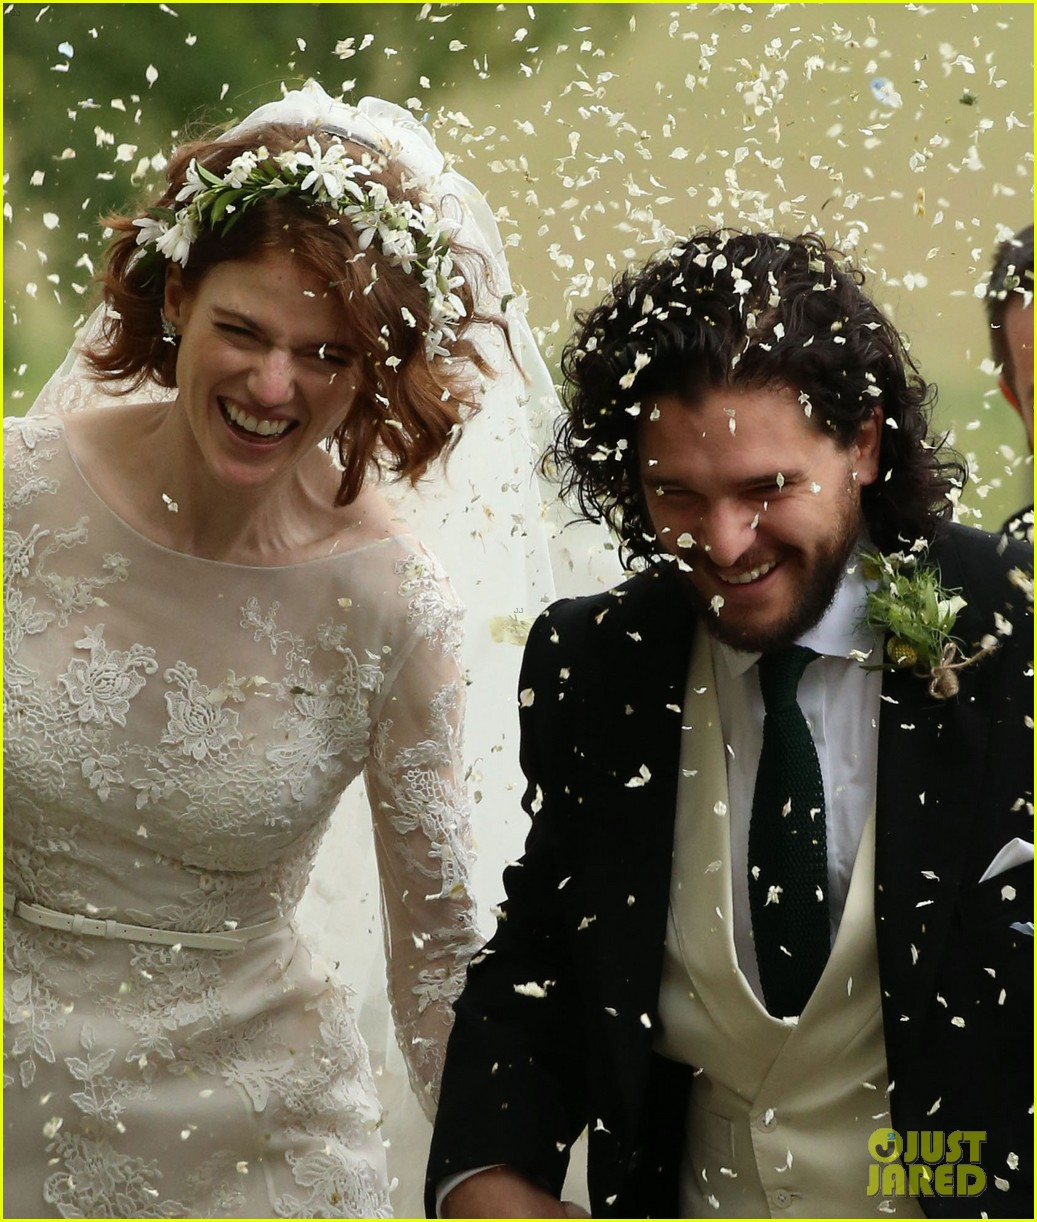 kit-harington-rose-leslie-wedding-photos-02.jpg